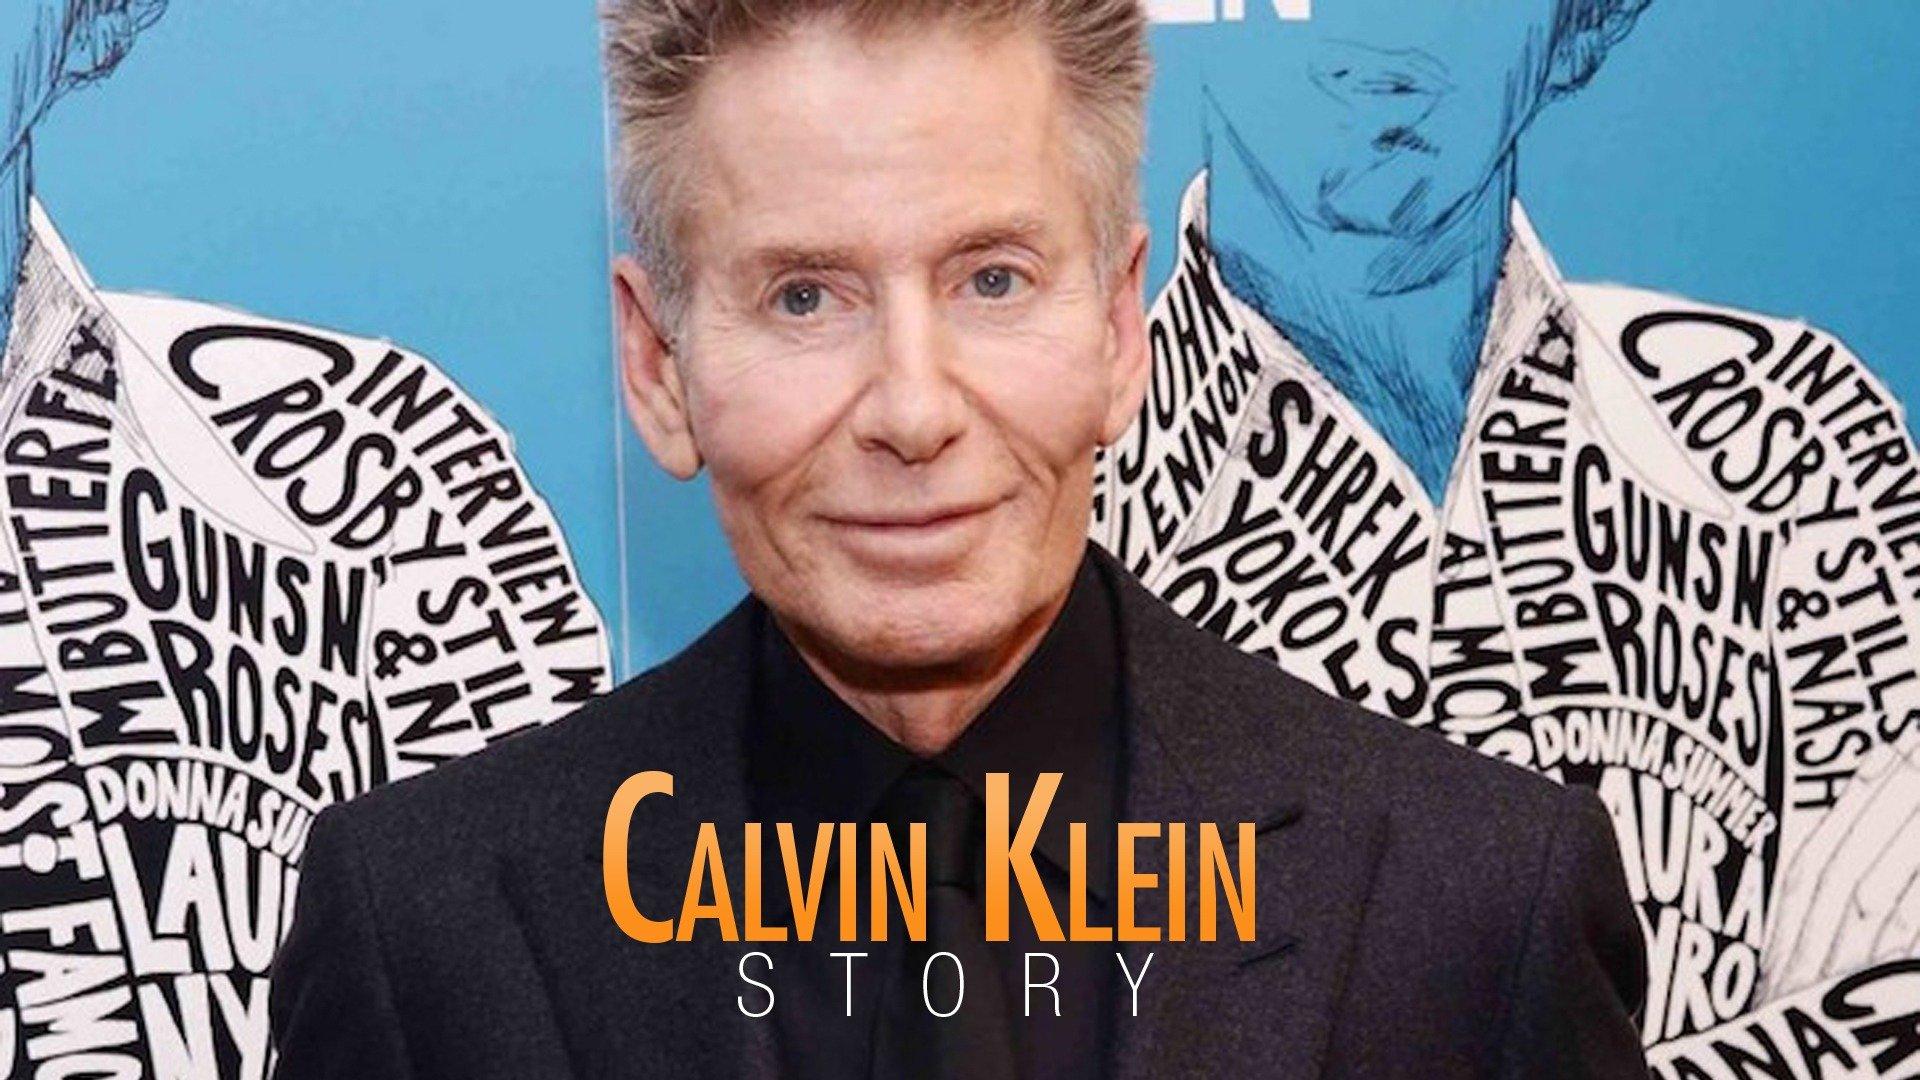 Calvin Klein Story